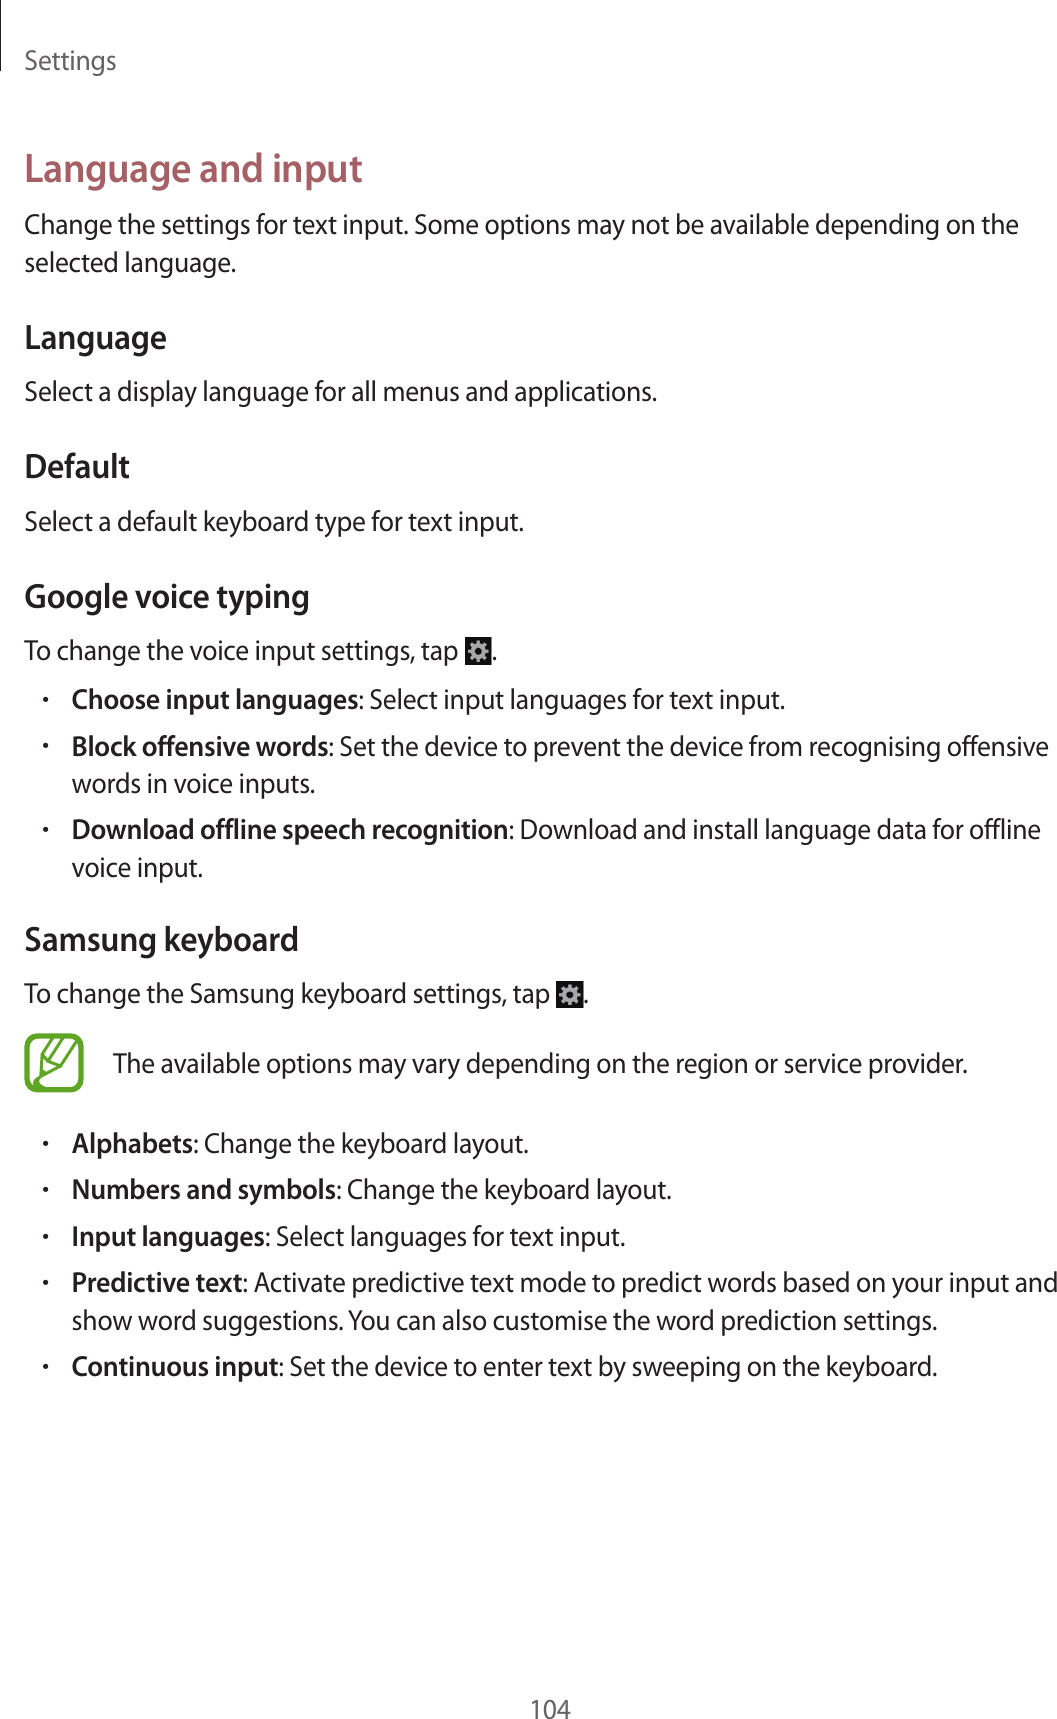 Samsung Galaxy Ace 3 S7275 4G LTE User Manual KHSAMGACE3 A